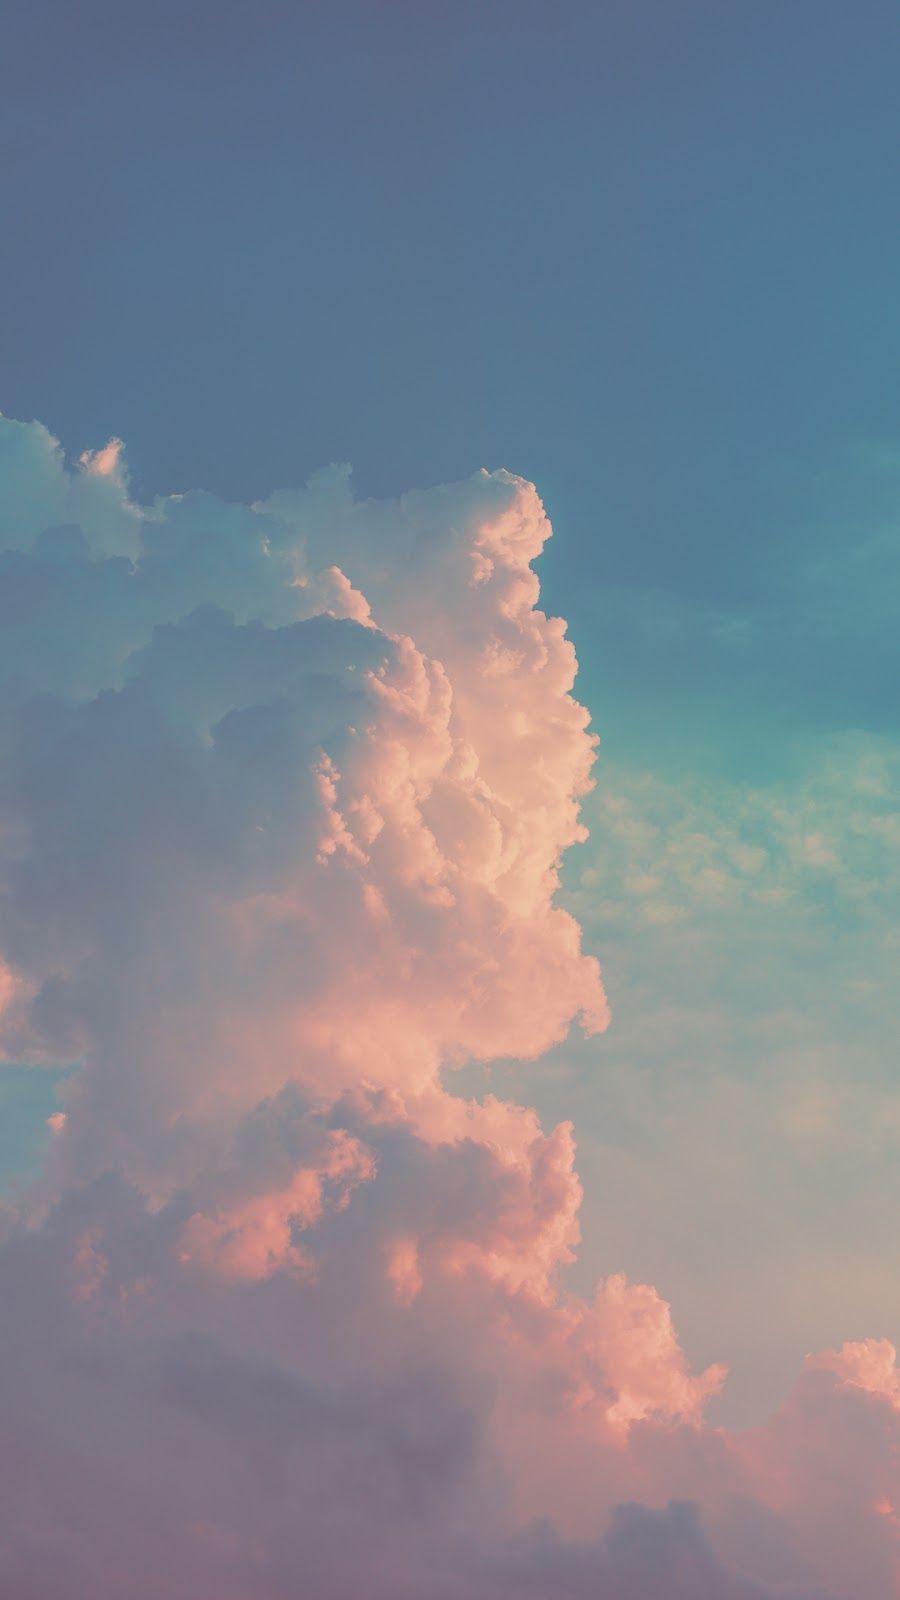 Free Download Cloud In The Sky Random Tumblr Wallpaper Cloud